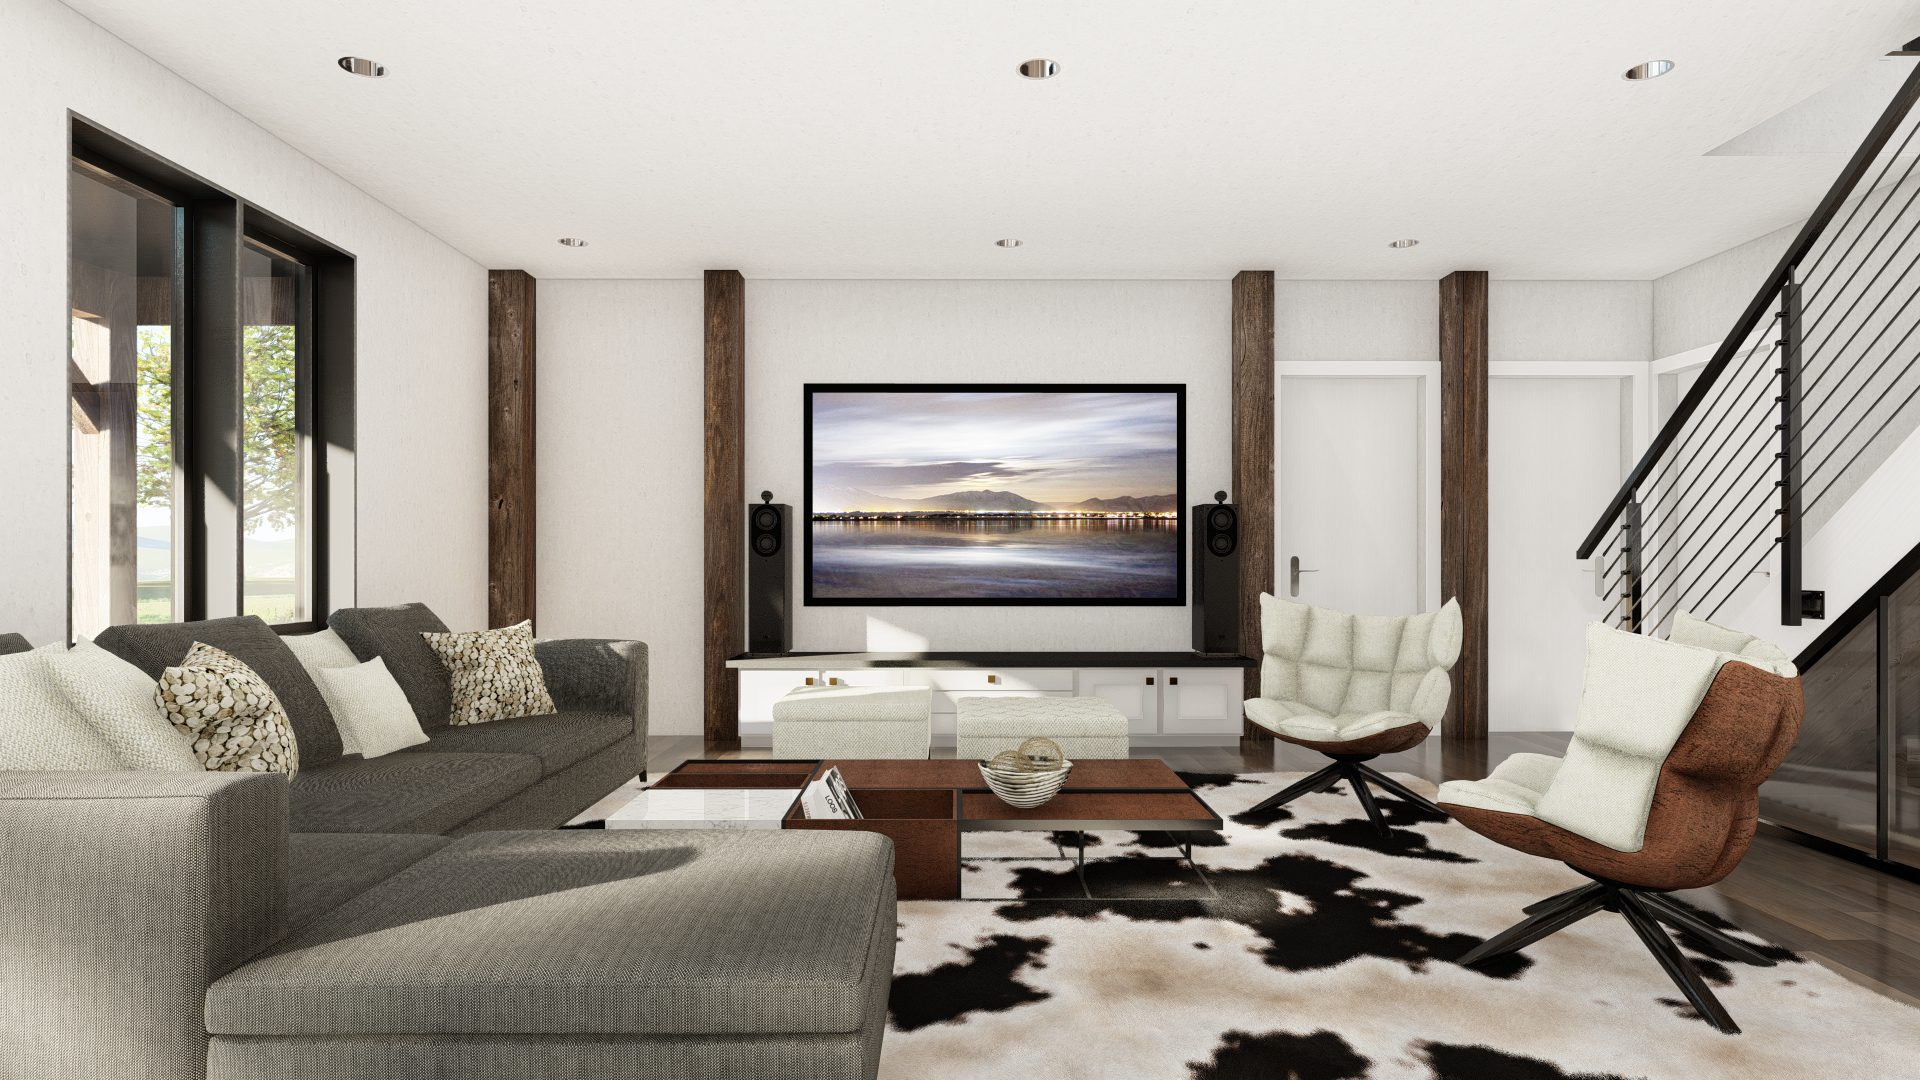 Normerica Timber Frames, House Plan, The Redstone 3920, Interior, Basement